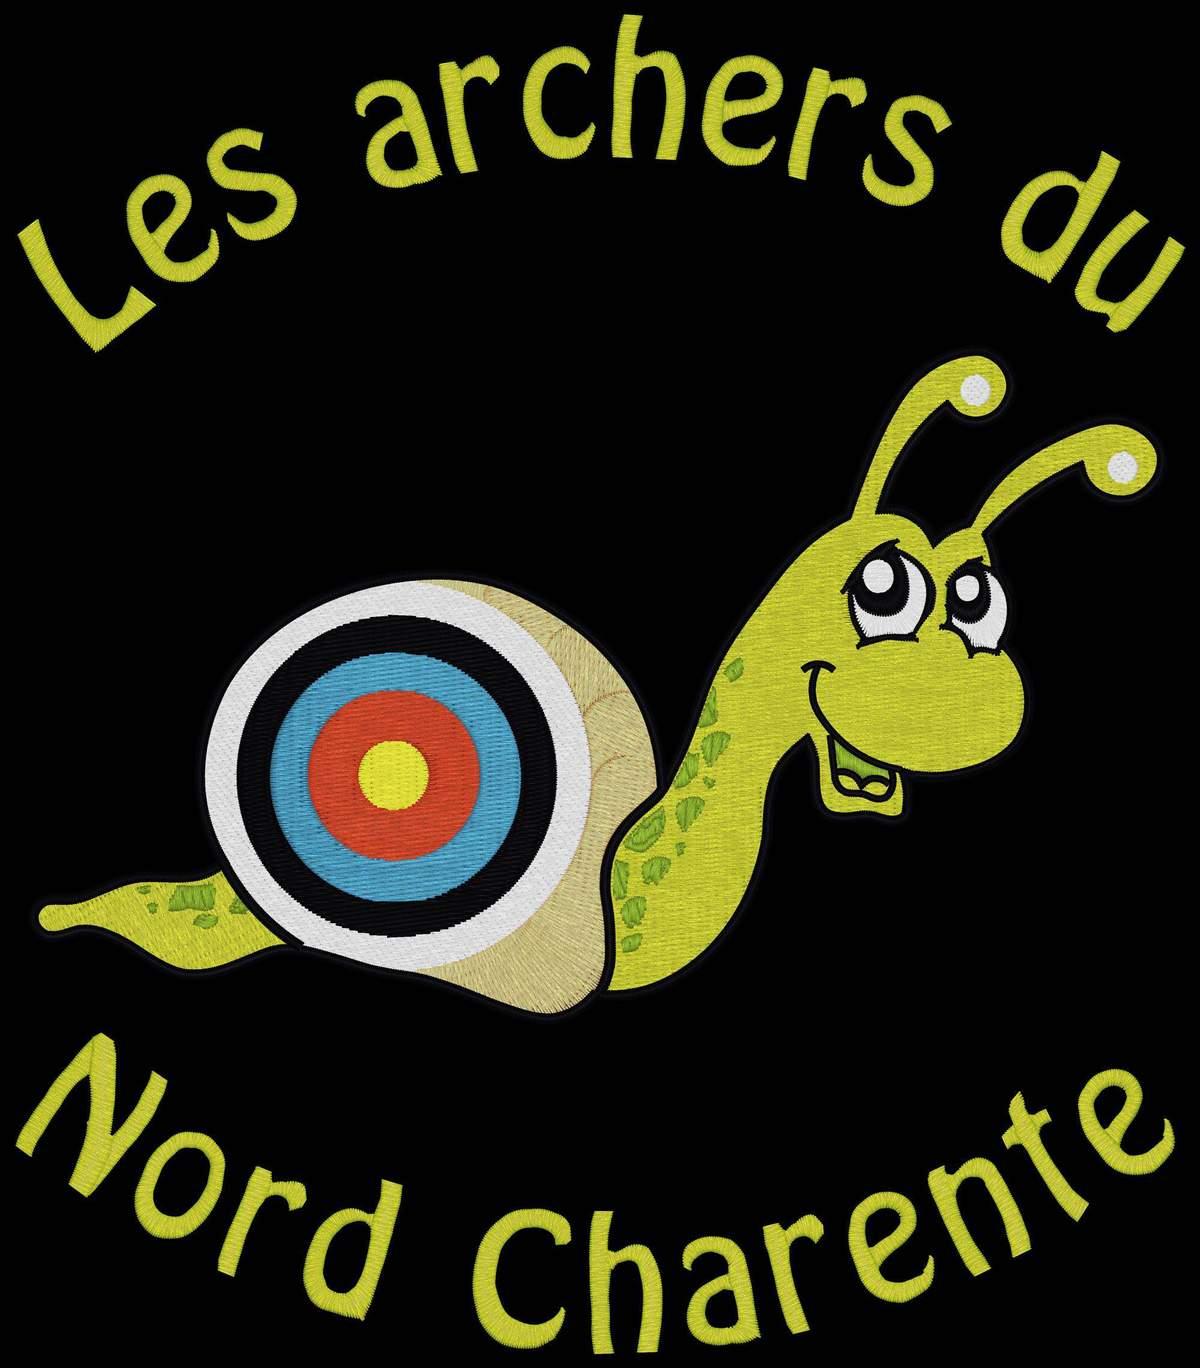 Http://www.evenements-sportifs.com/ffta-fr/